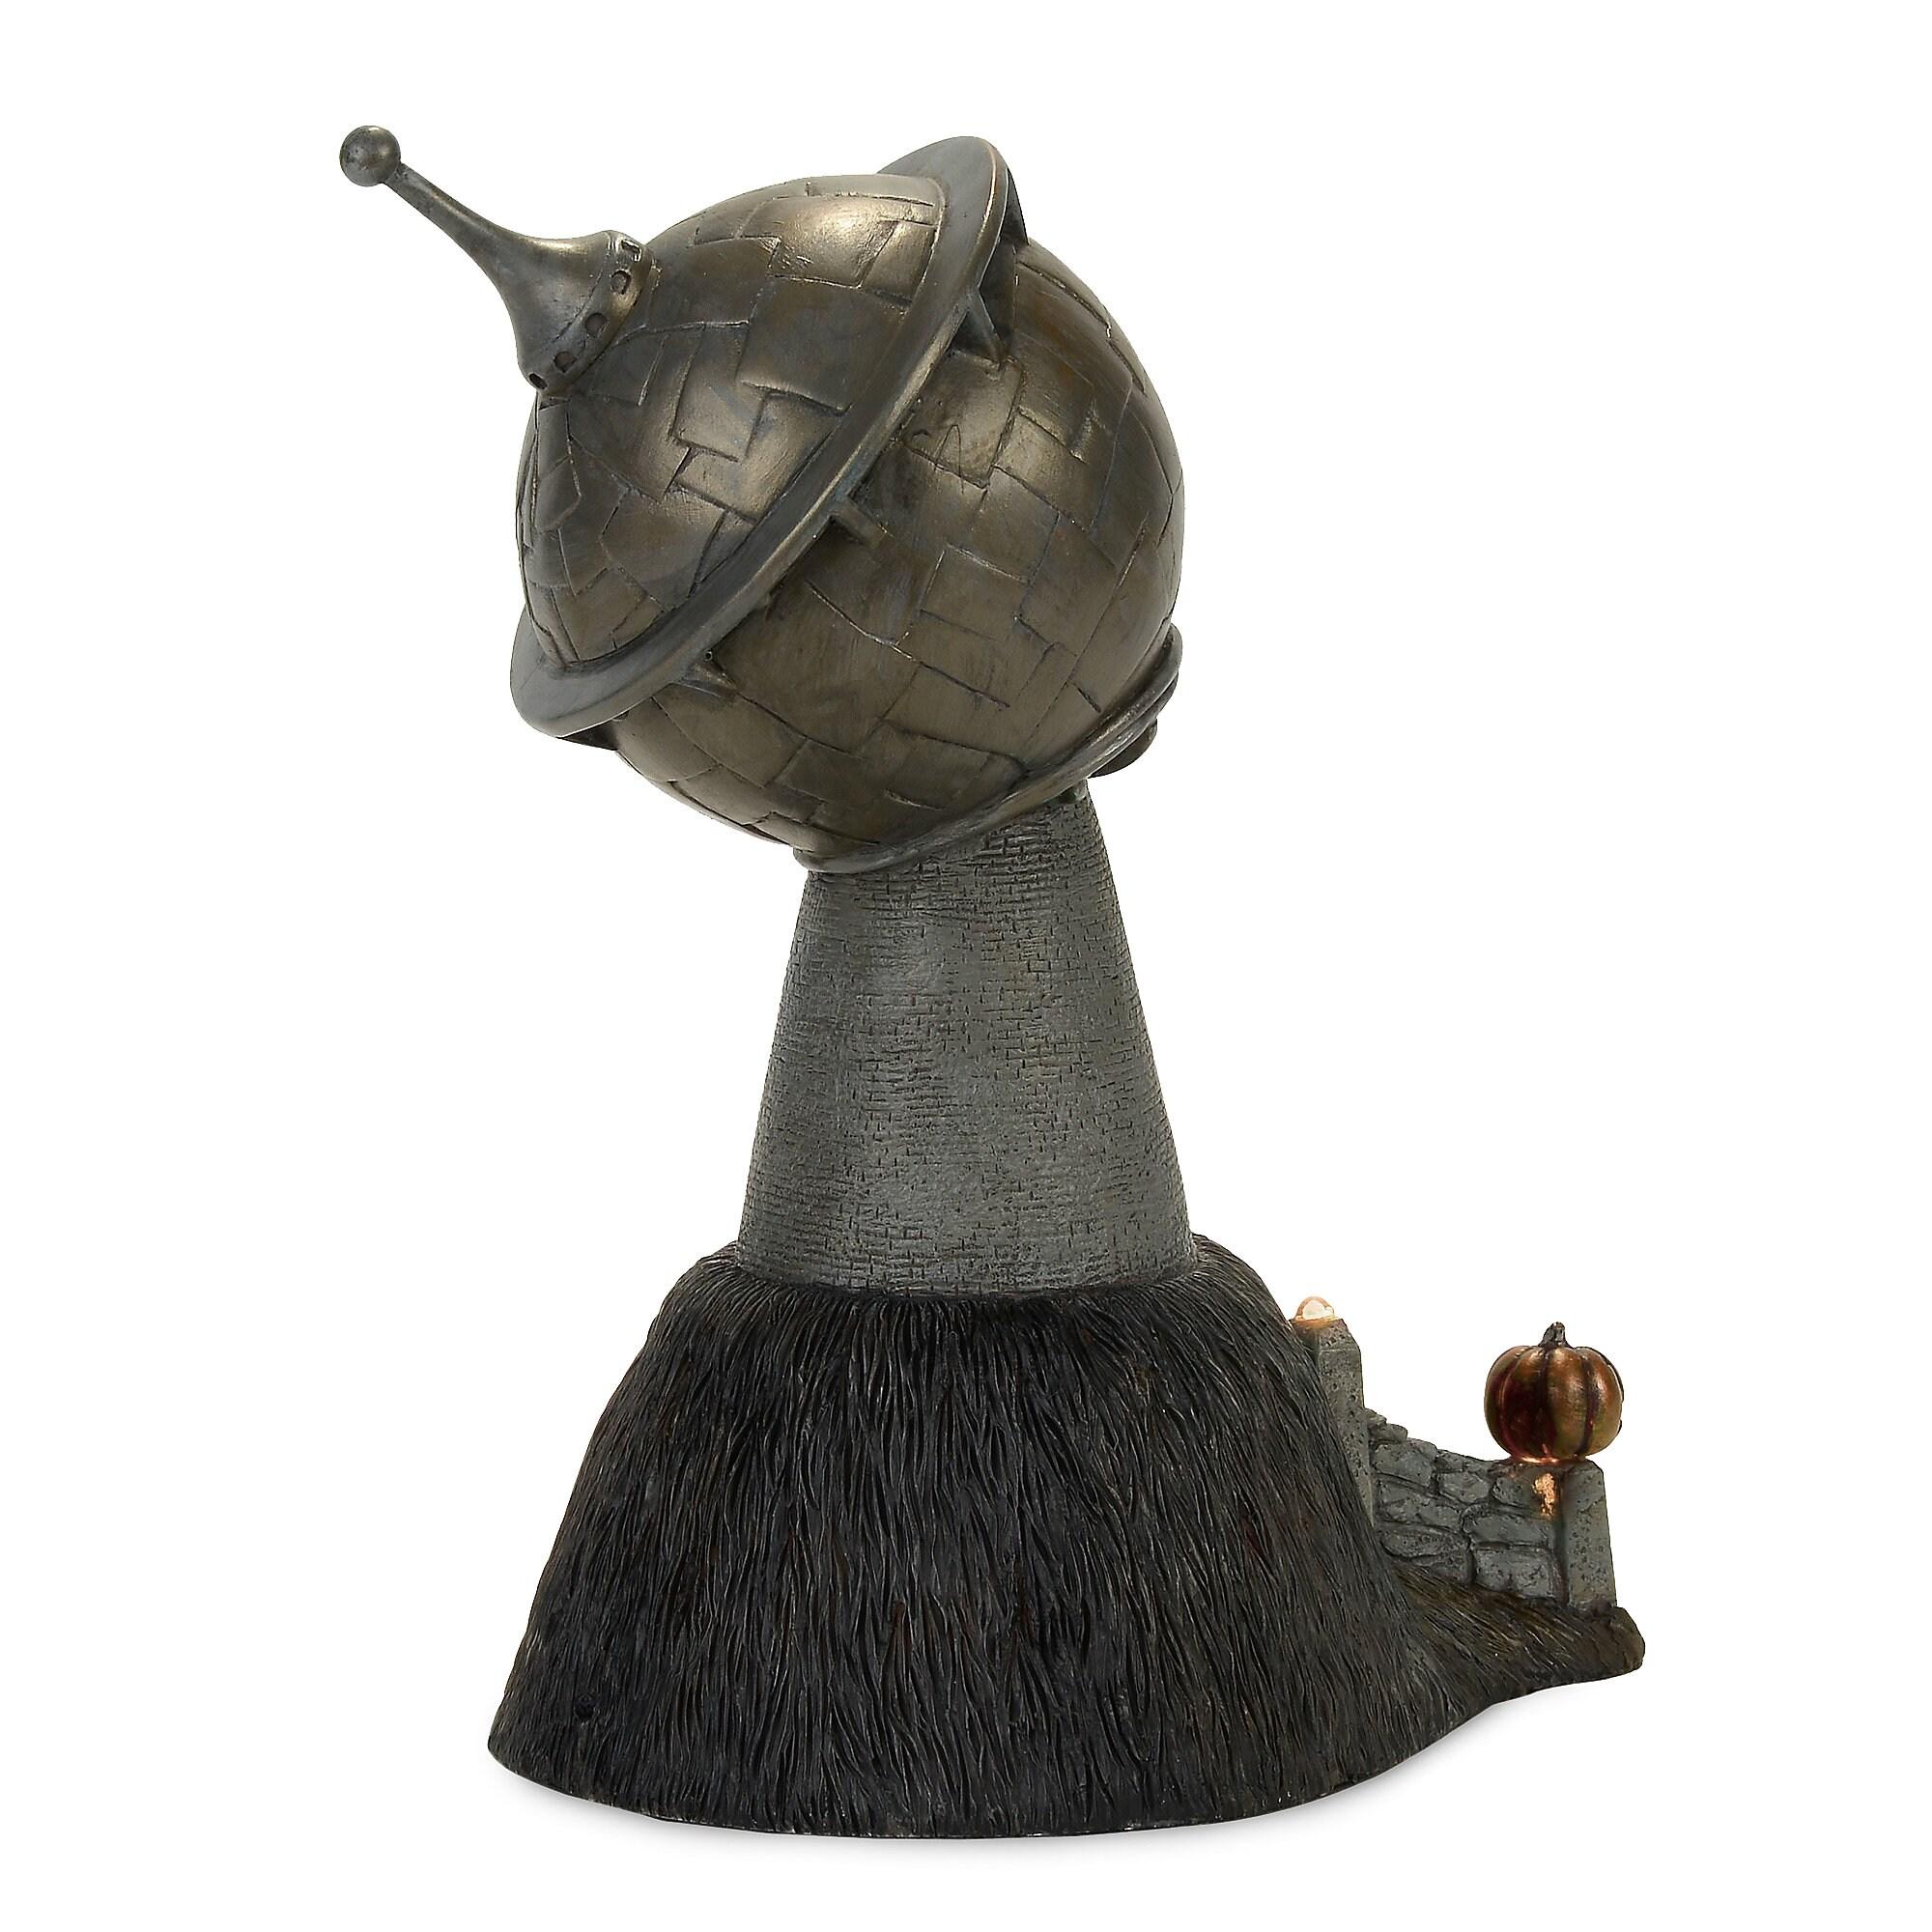 Dr. Finkelsteinu0027s Observatory - Tim Burtonu0027s The Nightmare Before Christmas Village by Dept. 56  sc 1 st  shopDisney & Dr. Finkelsteinu0027s Observatory - Tim Burtonu0027s The Nightmare Before ...